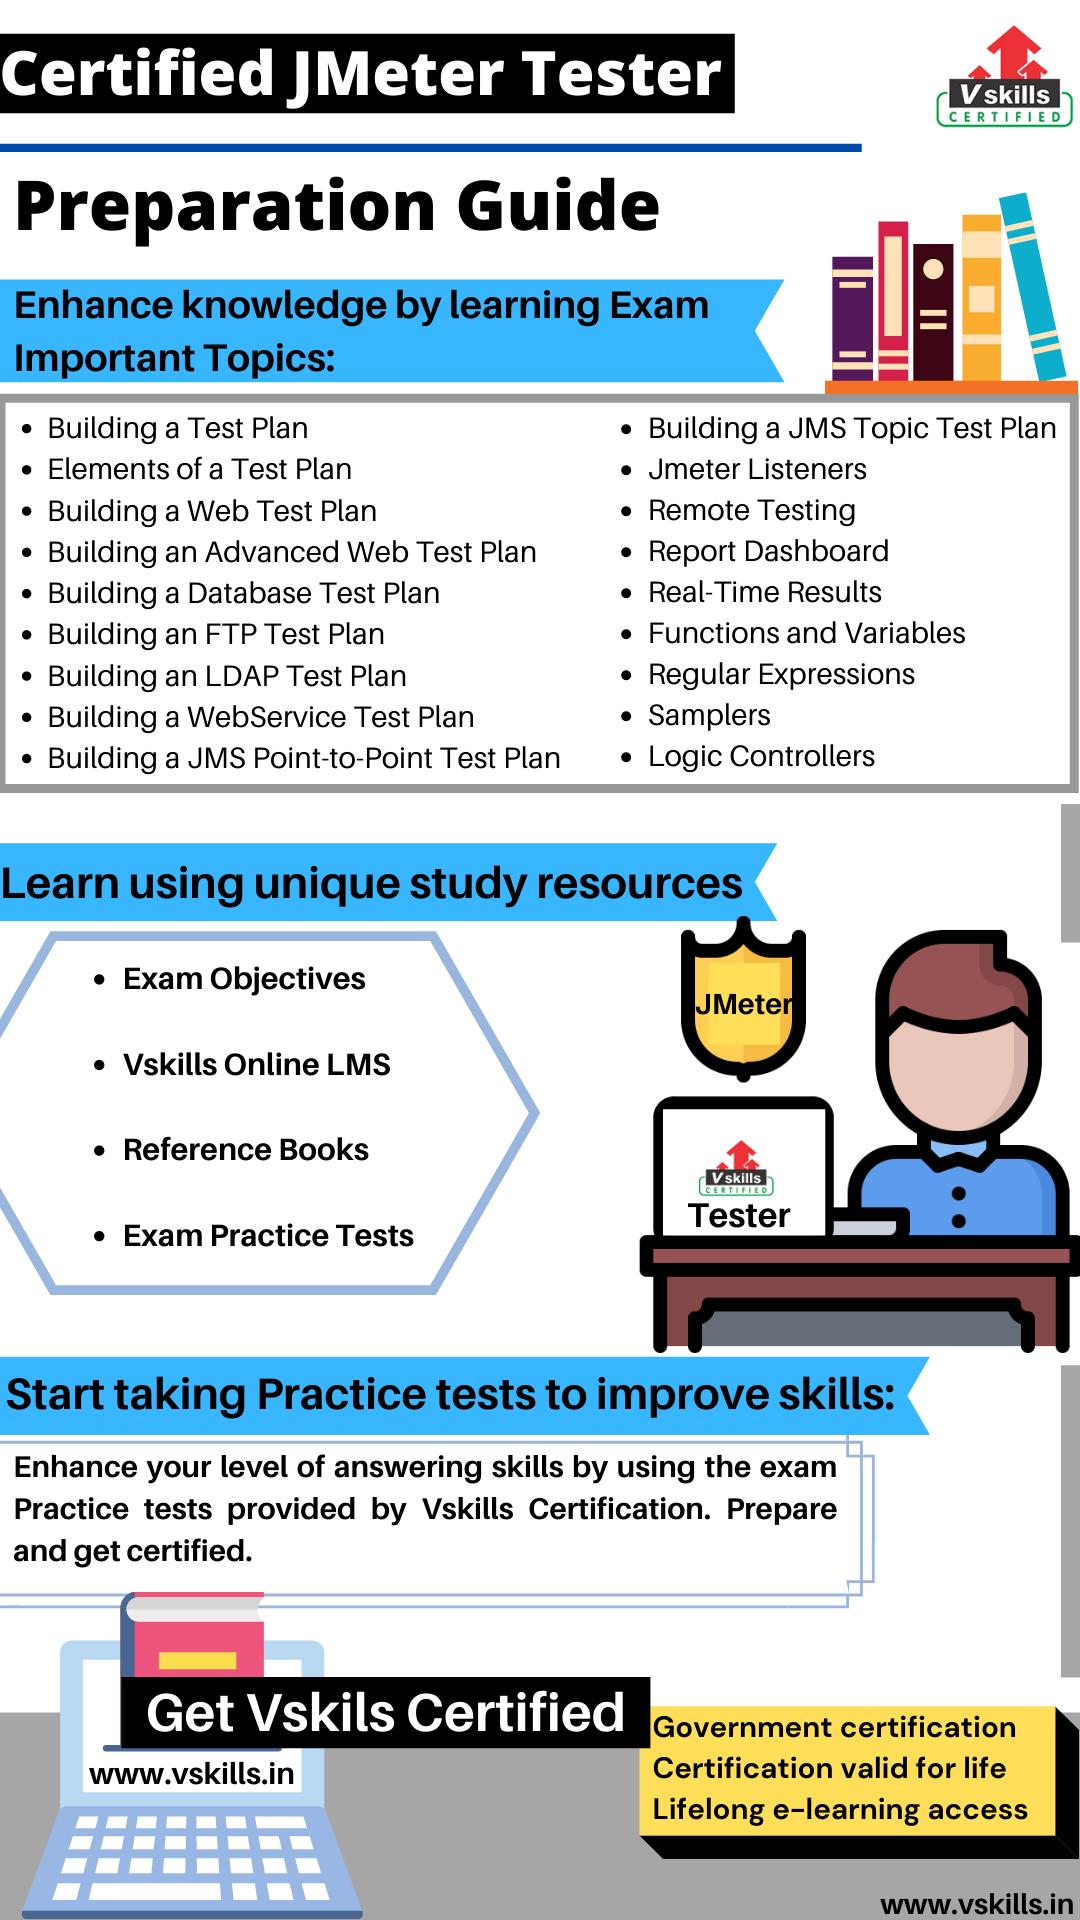 Certified JMeter Tester study guide